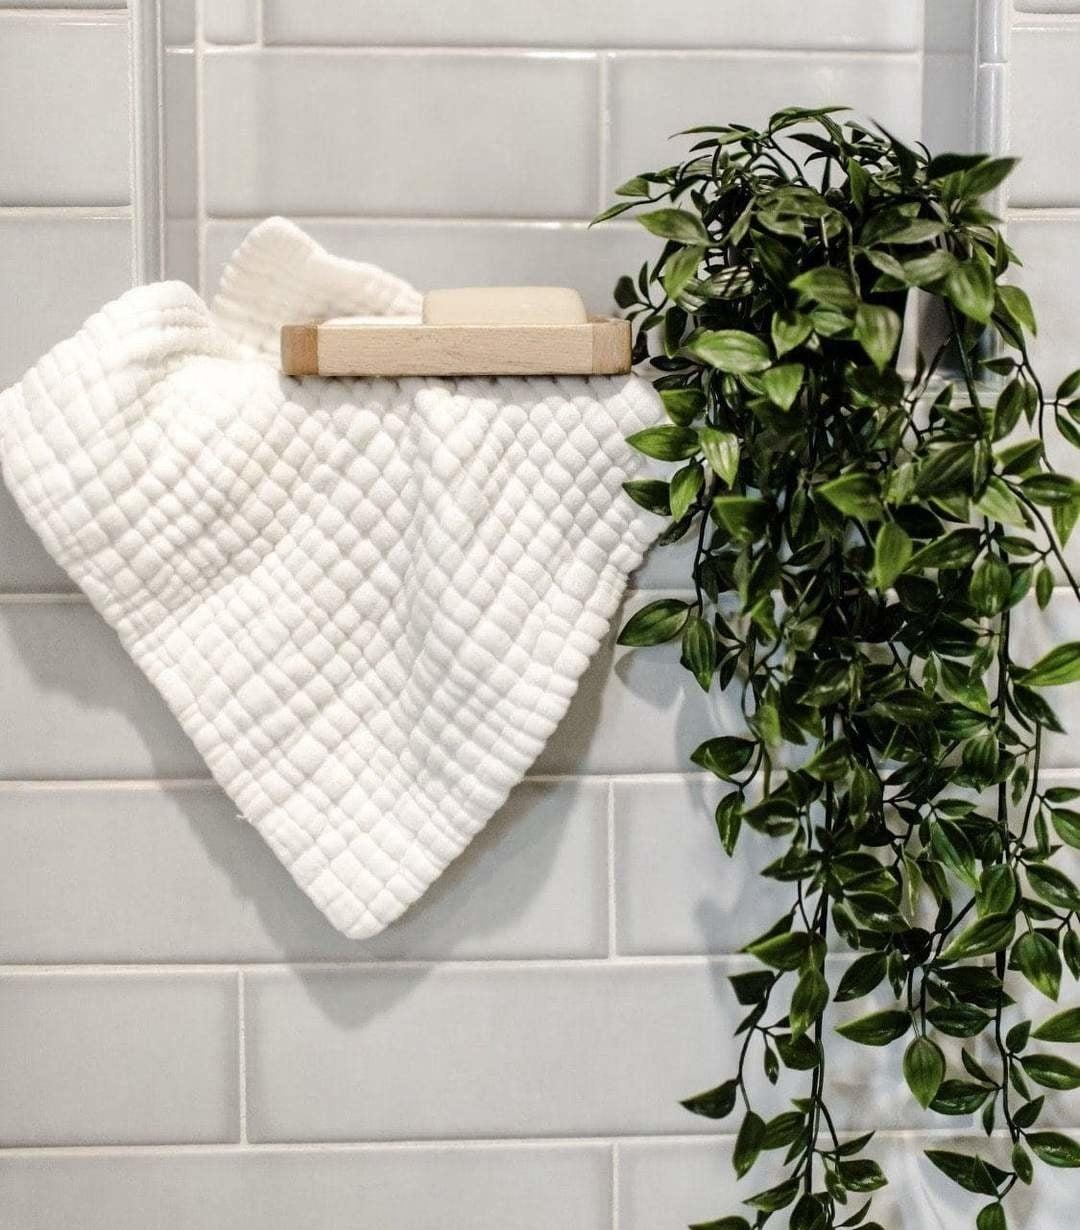 The white muslin washcloth